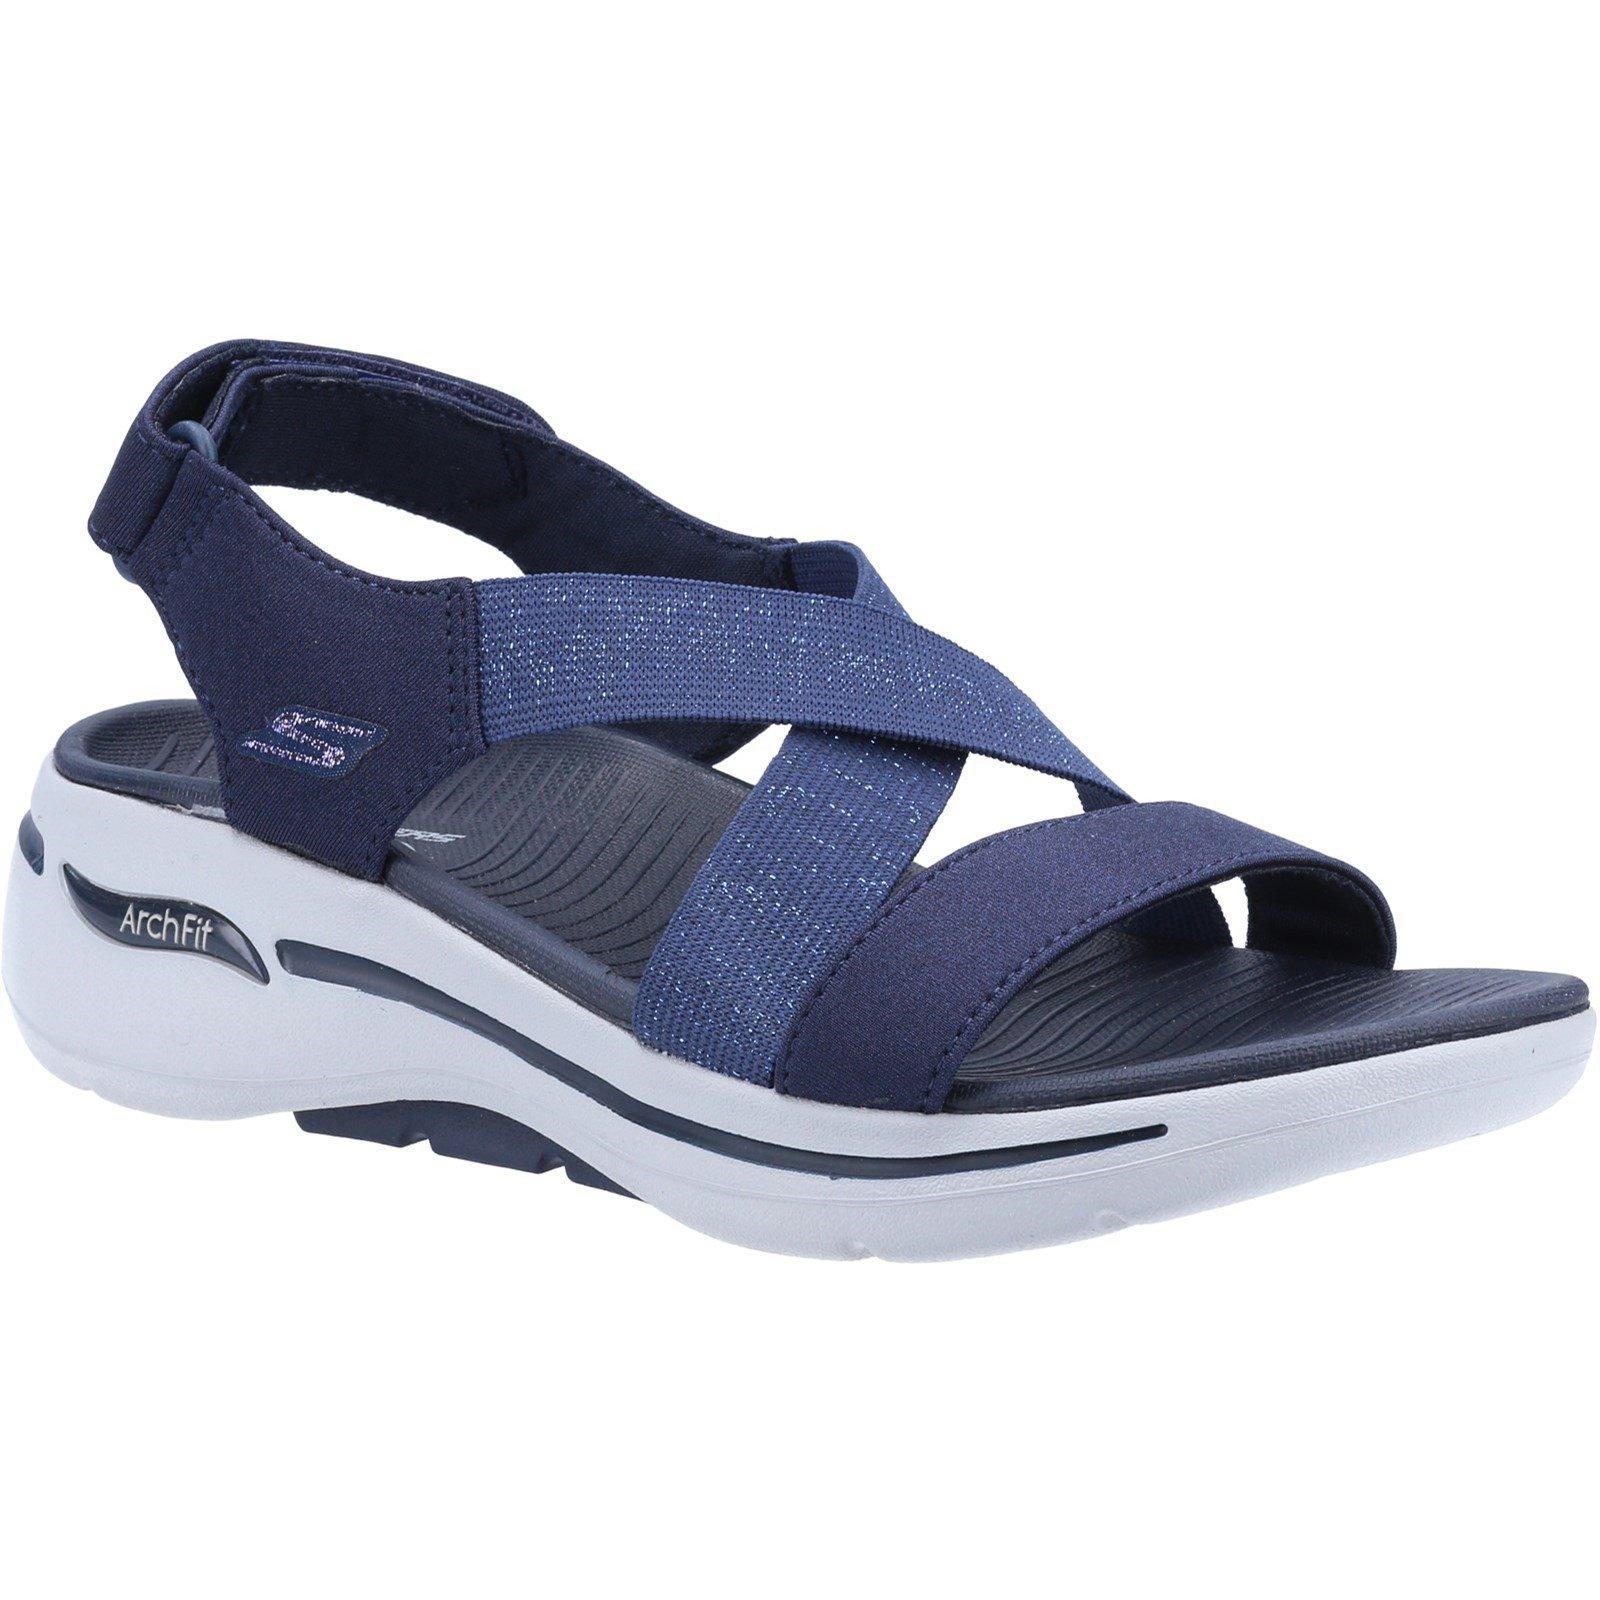 Skechers Women's Go Walk Arch Fit Astonish Summer Sandal Various Colours 32153 - Navy 6